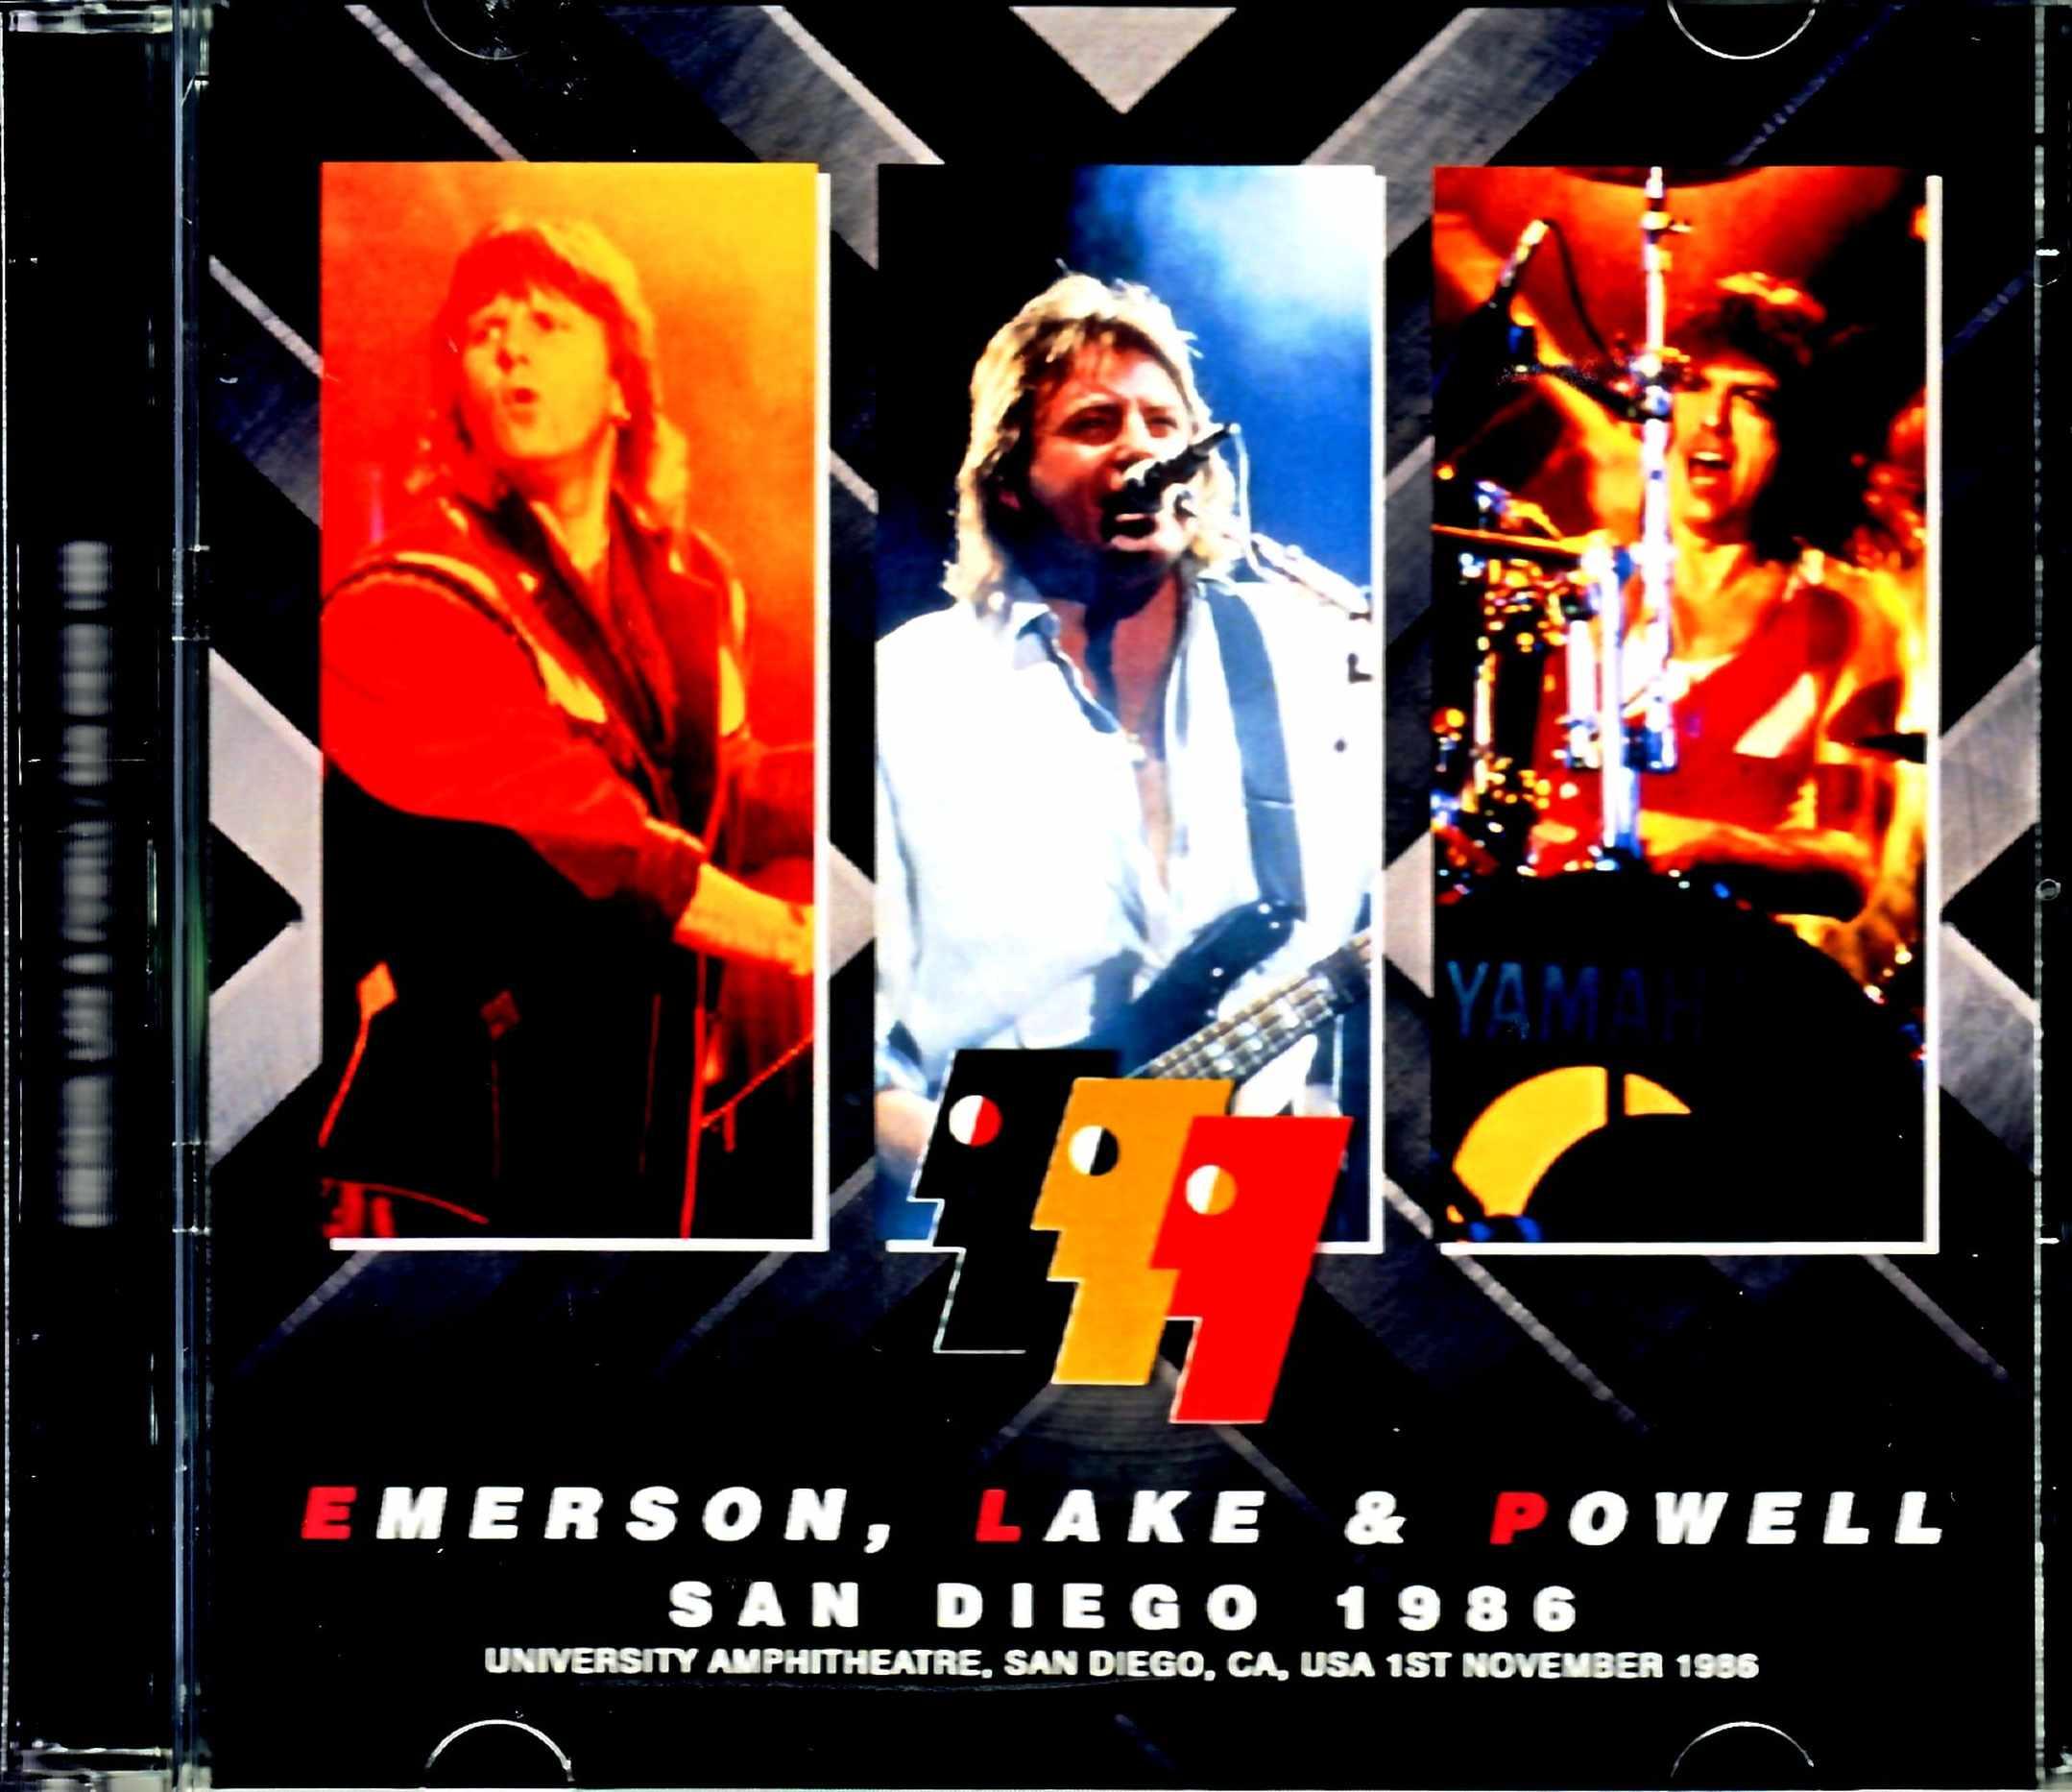 EL & P Emerson,Lake & Palmer エマーソン・レイク・アンド・パーマー/CA,USA 11.1.1986